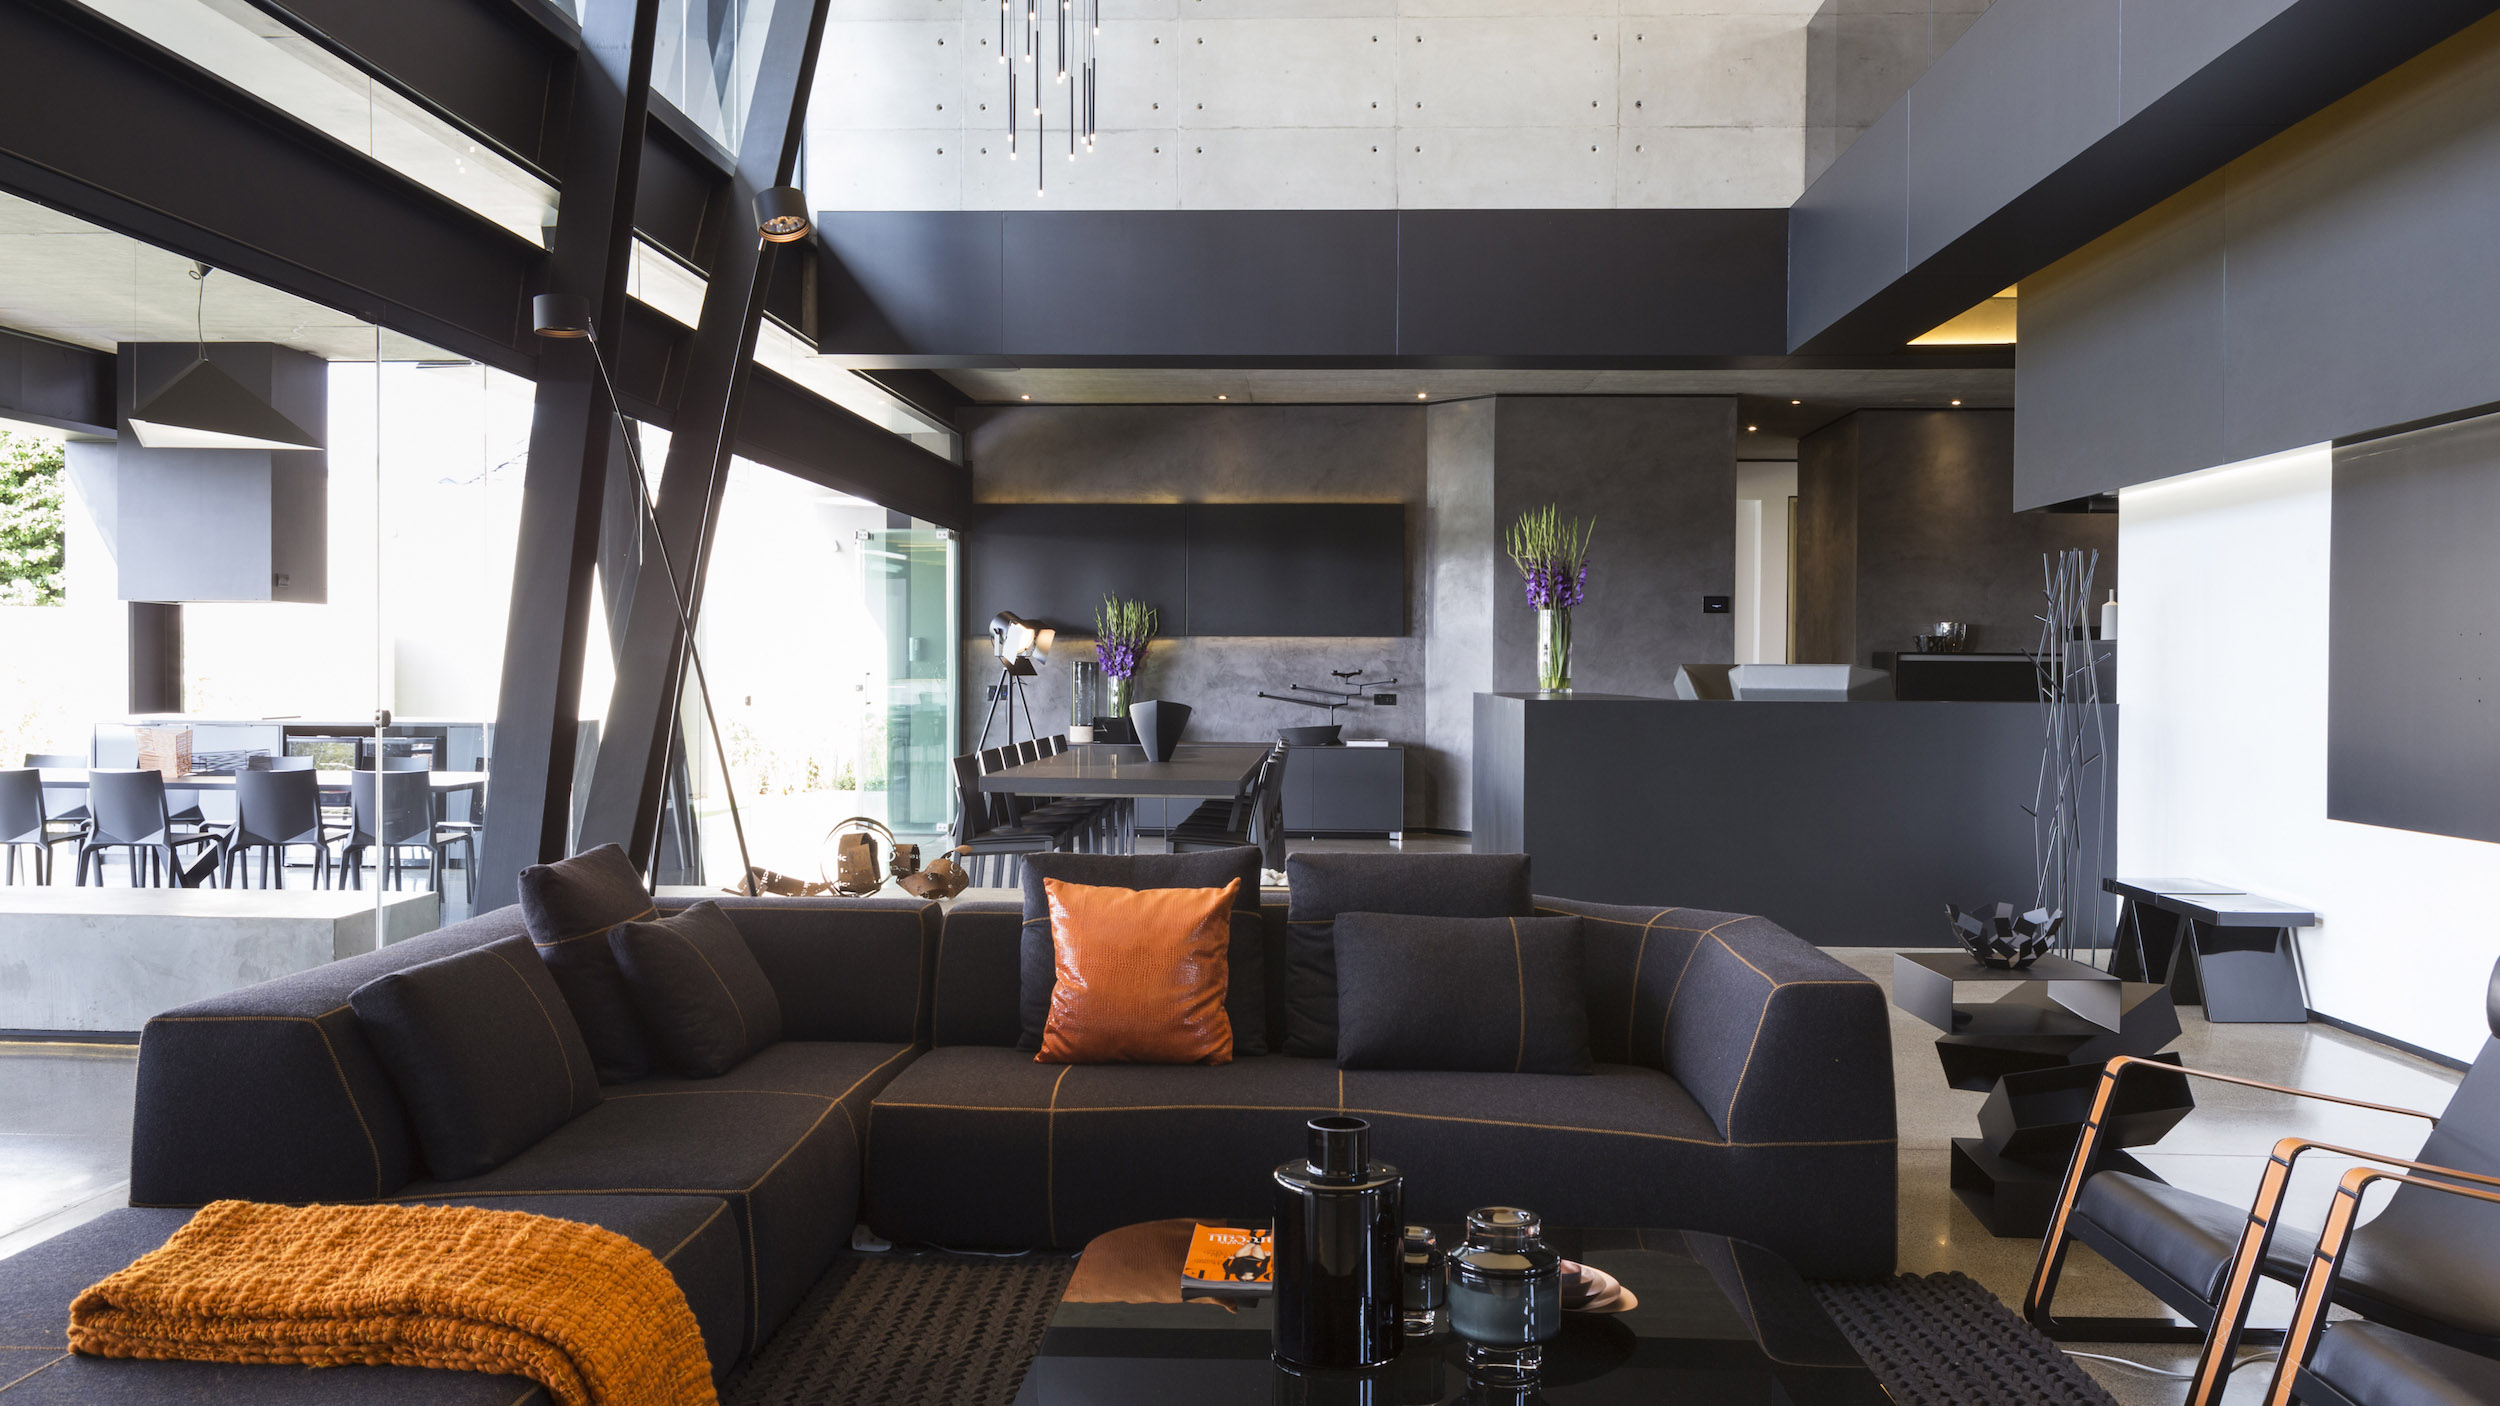 Kloof Road Masterpiece House in Johannesburg by Nico van der Meulen Architects-17